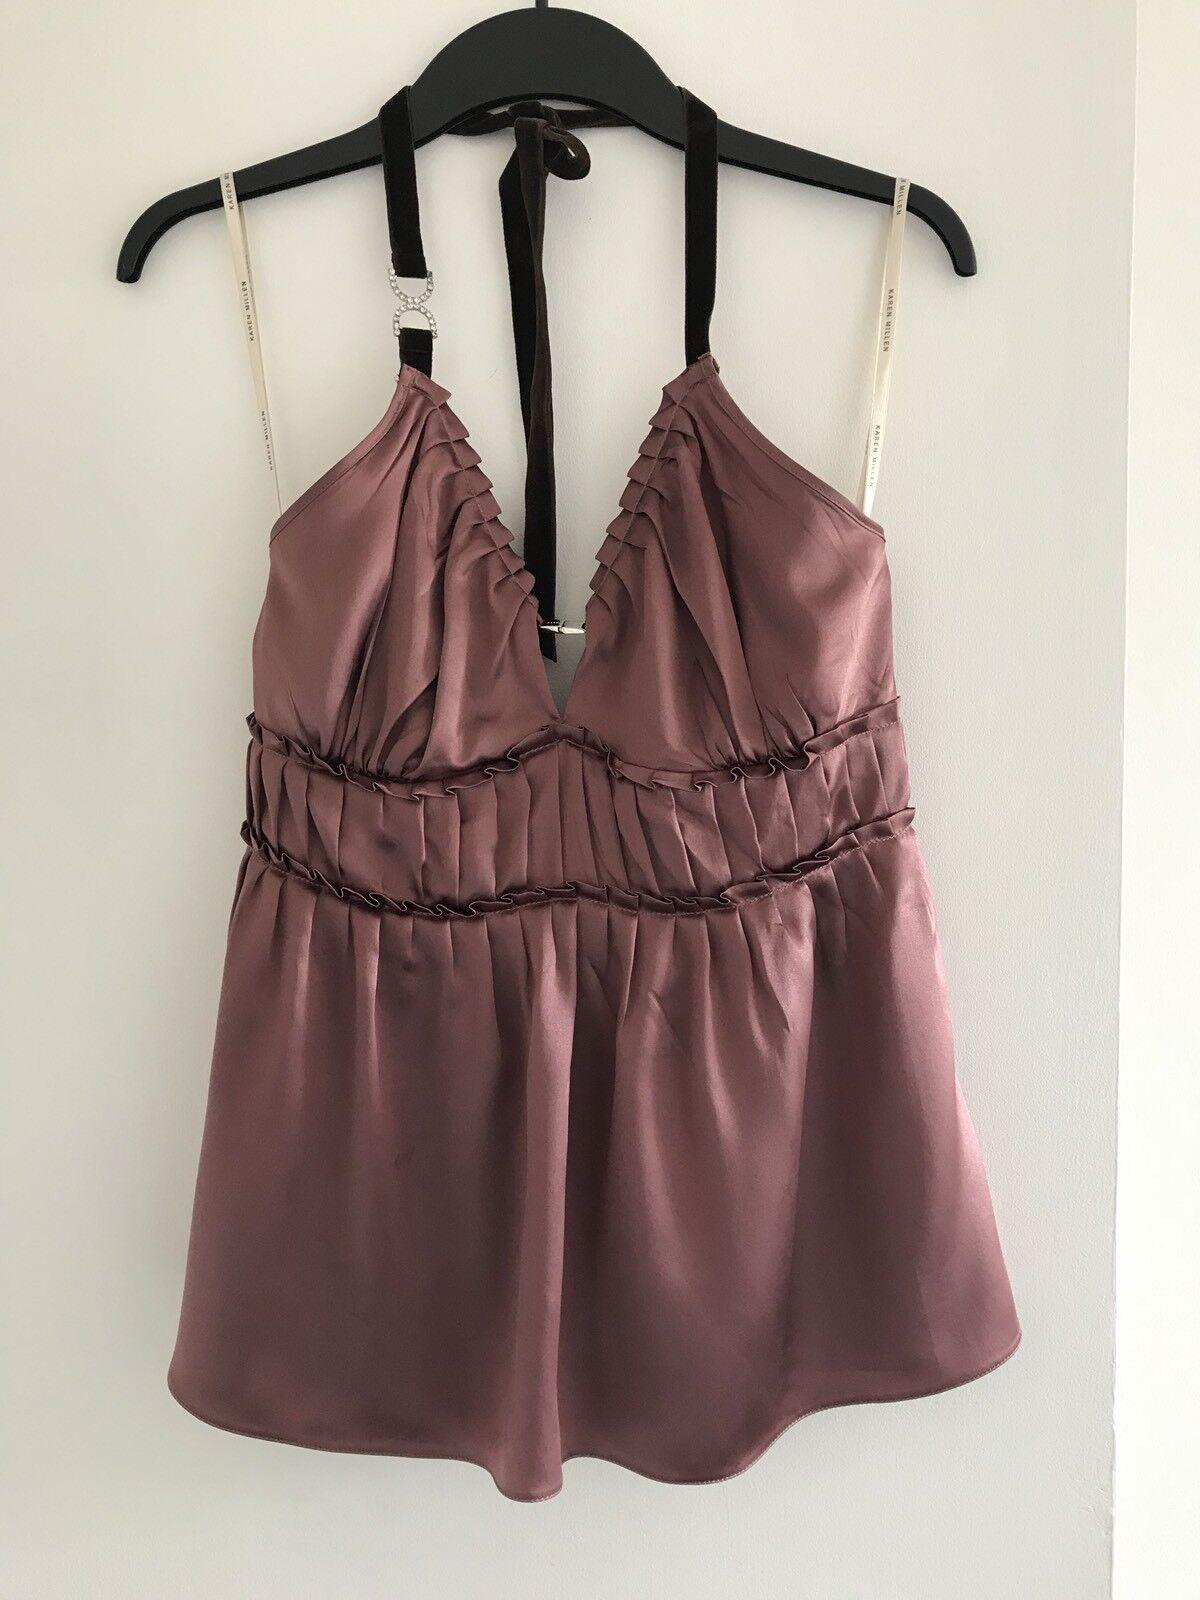 fedfeb58b61 BNWOT Karen Millen pink (Pink) 100% Silk Top-Size US 8, Ladies gold ...